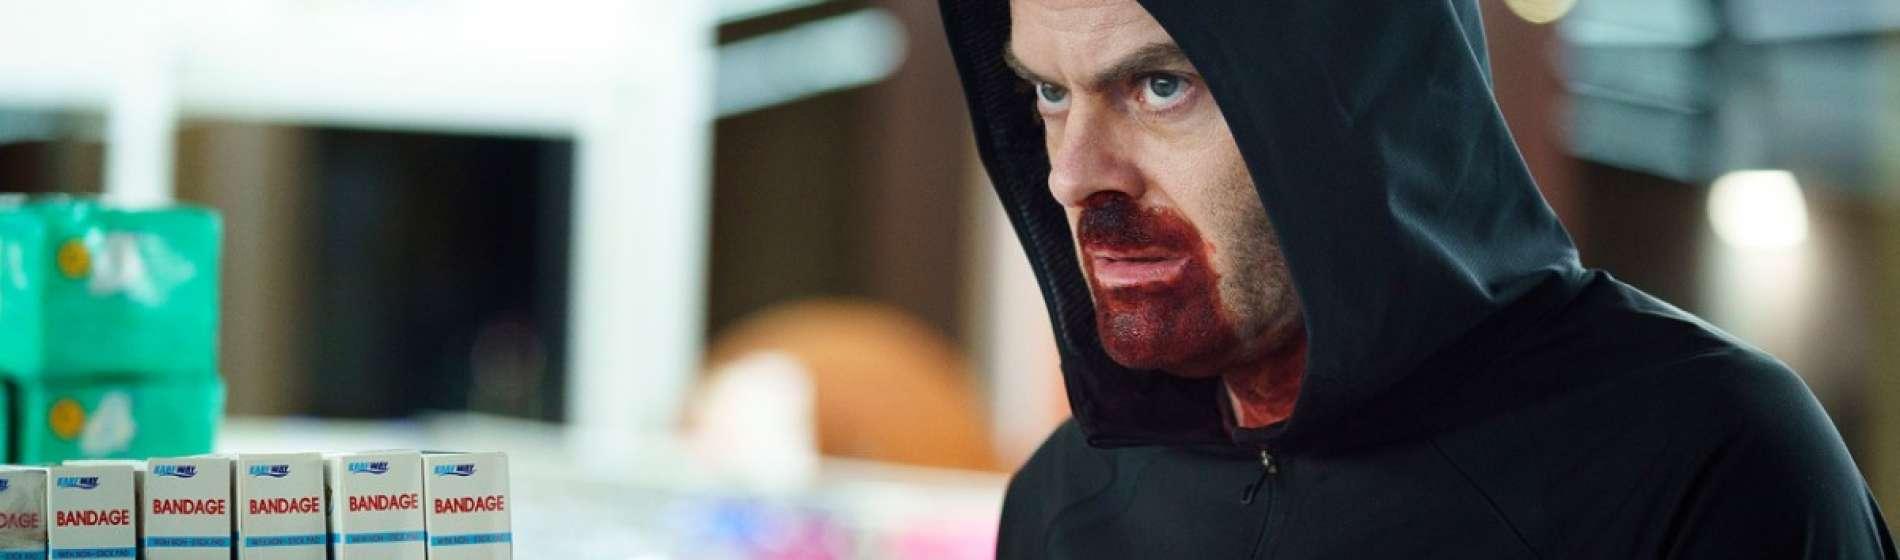 Barry Season 2 Episode 5 Featured